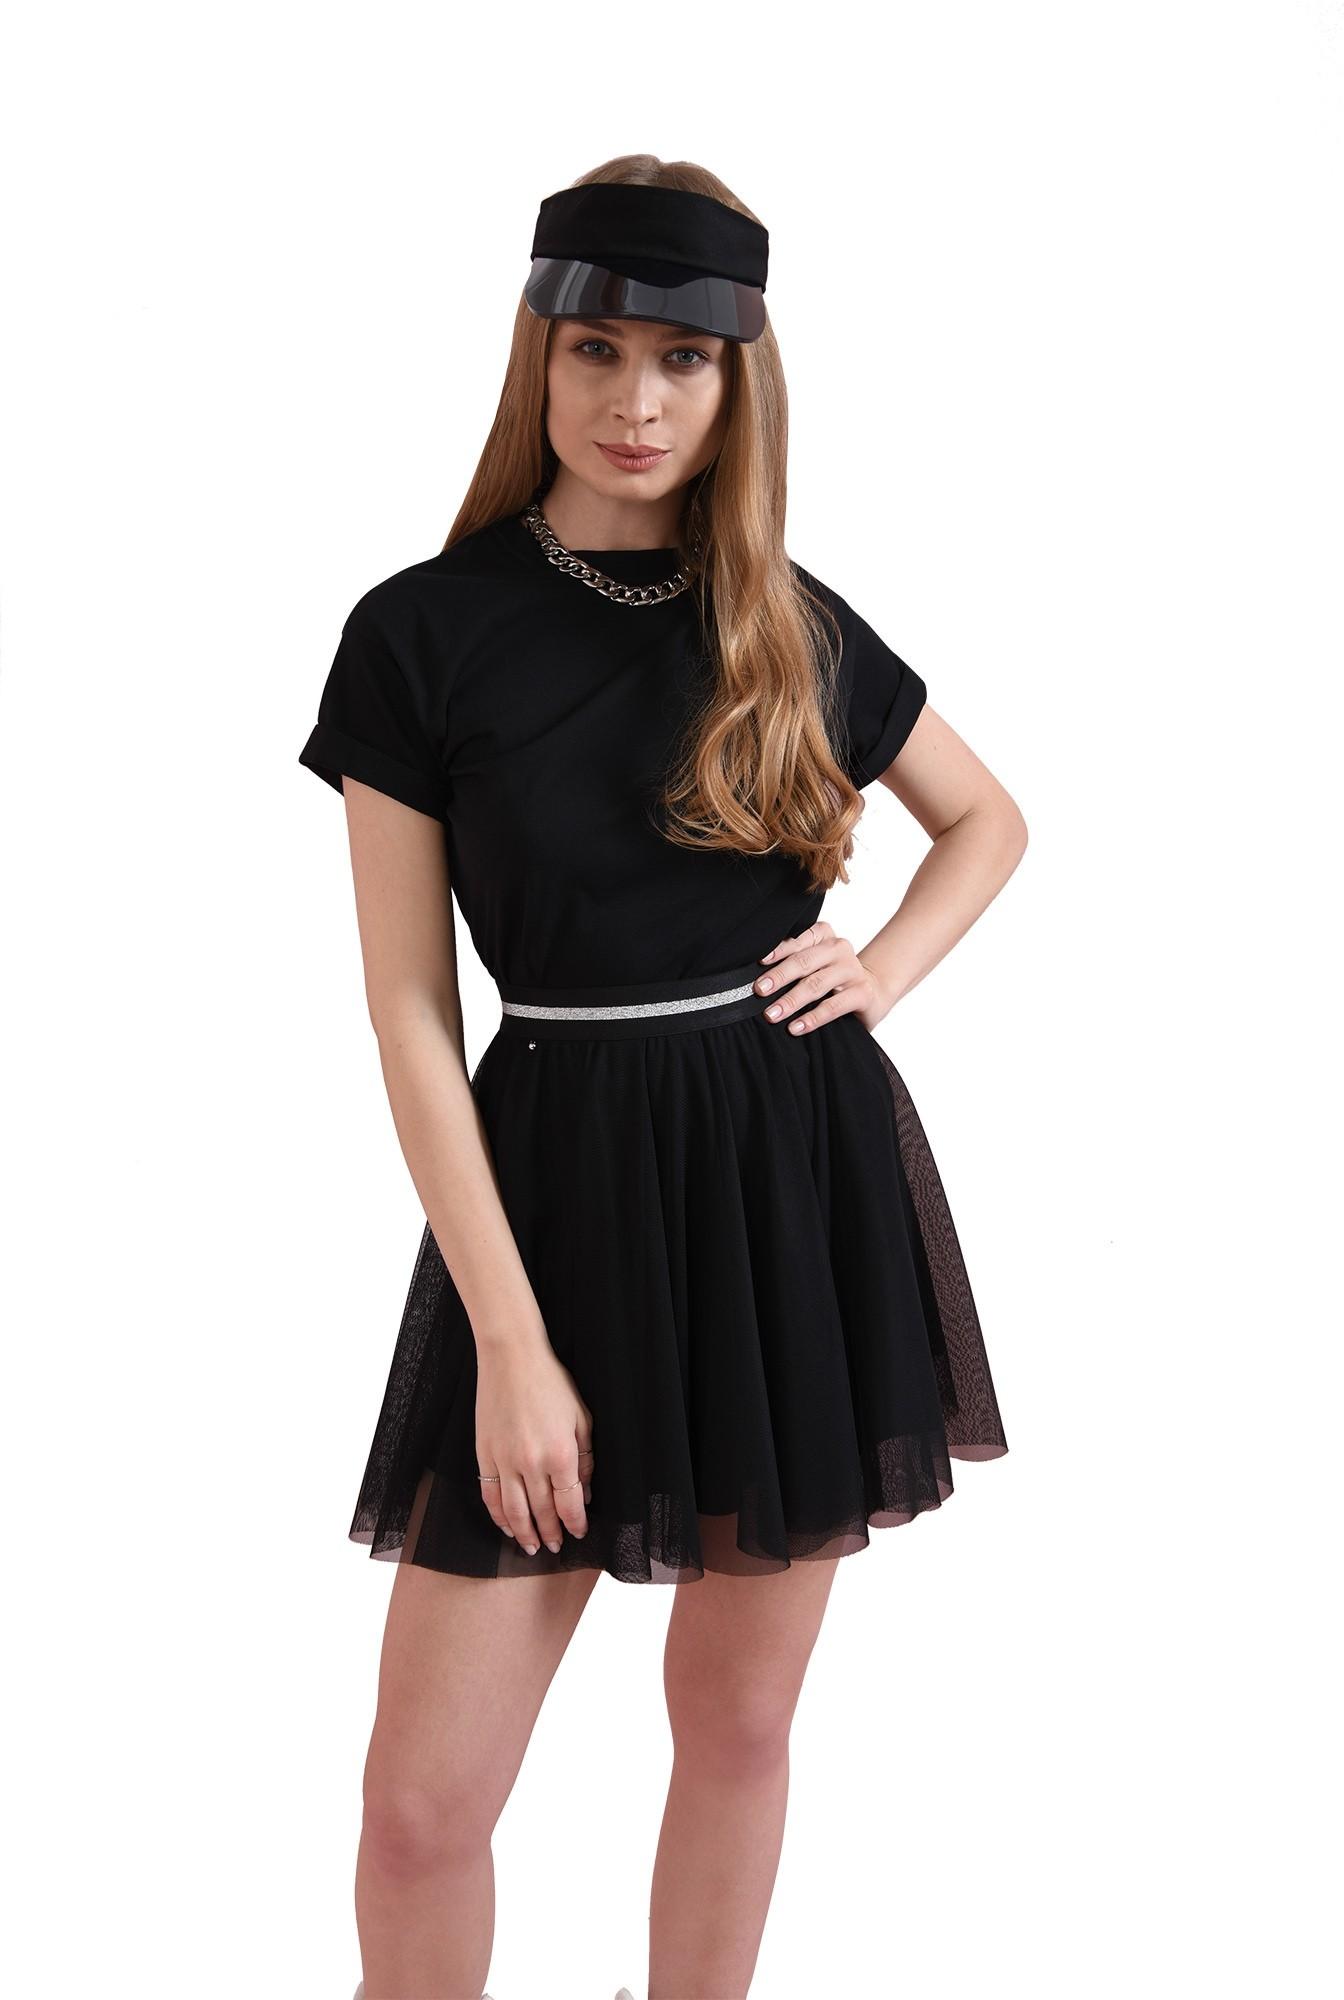 3 - fusta neagra, din tul, cu insertie glitter la talie